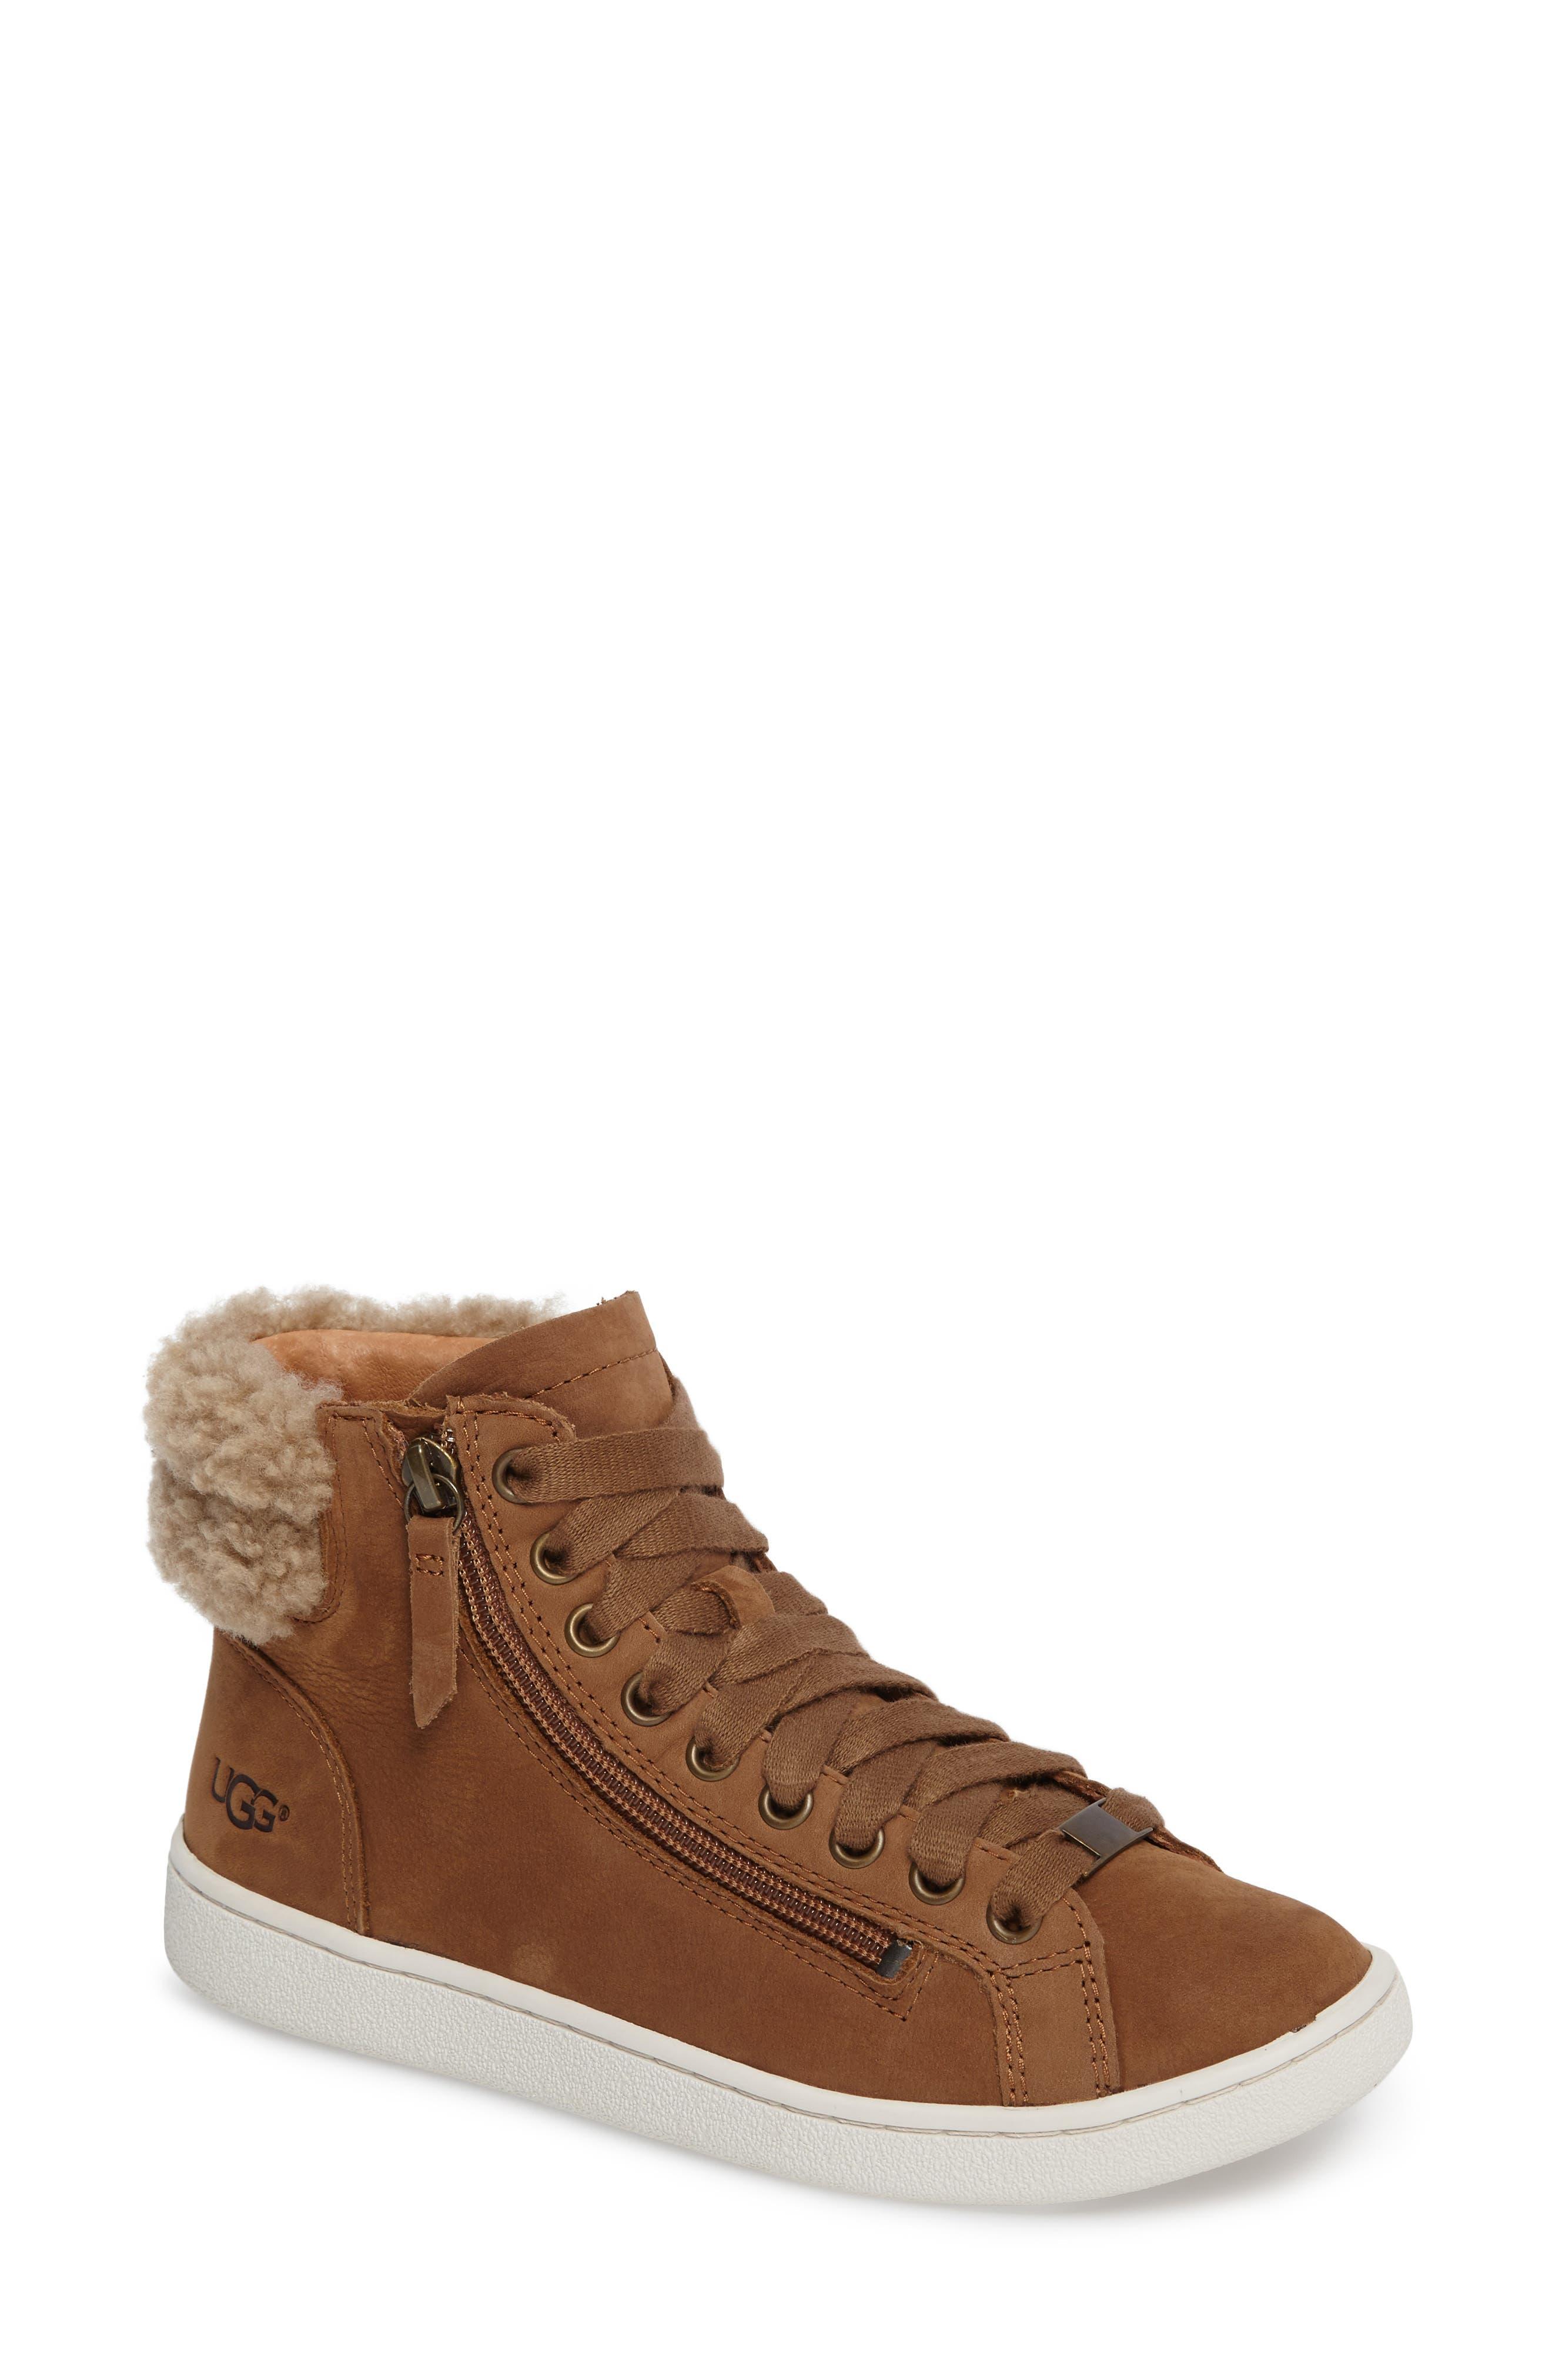 Olive Genuine Shearling Cuff Sneaker,                         Main,                         color, 219